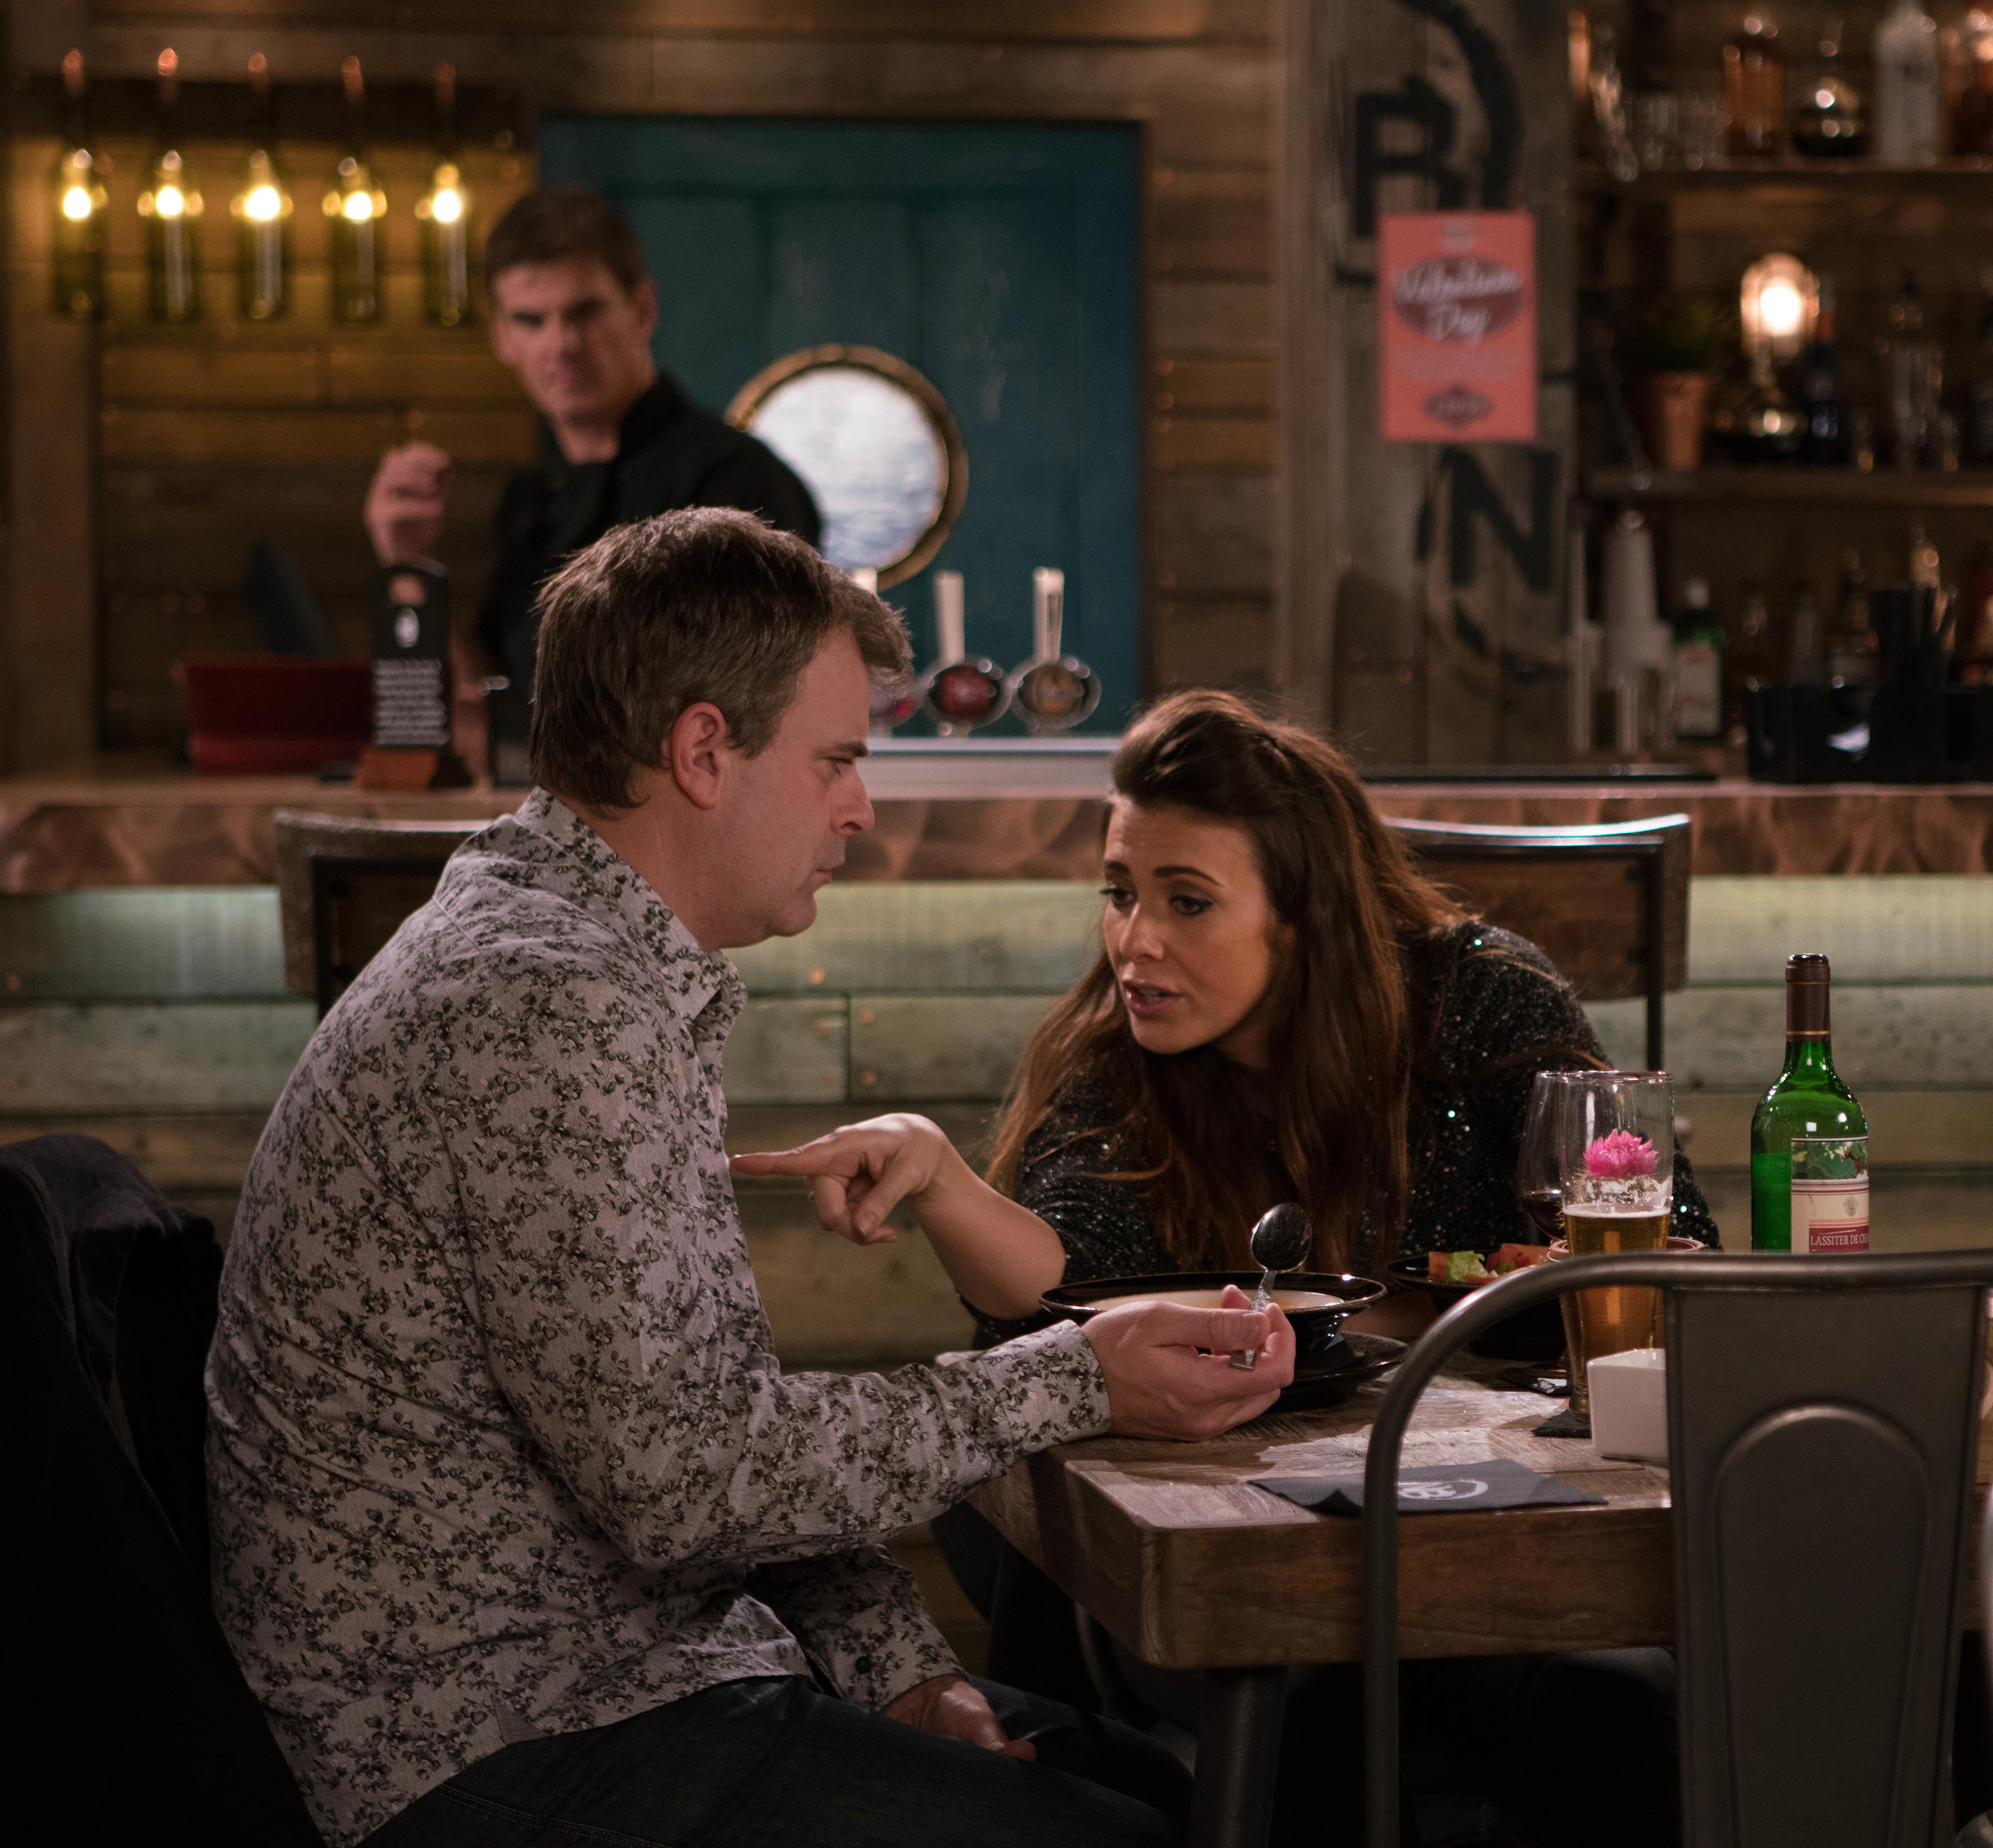 'Coronation Street' Spoiler! Michelle Connor 'To Divorce Steve McDonald' After Baby Secret